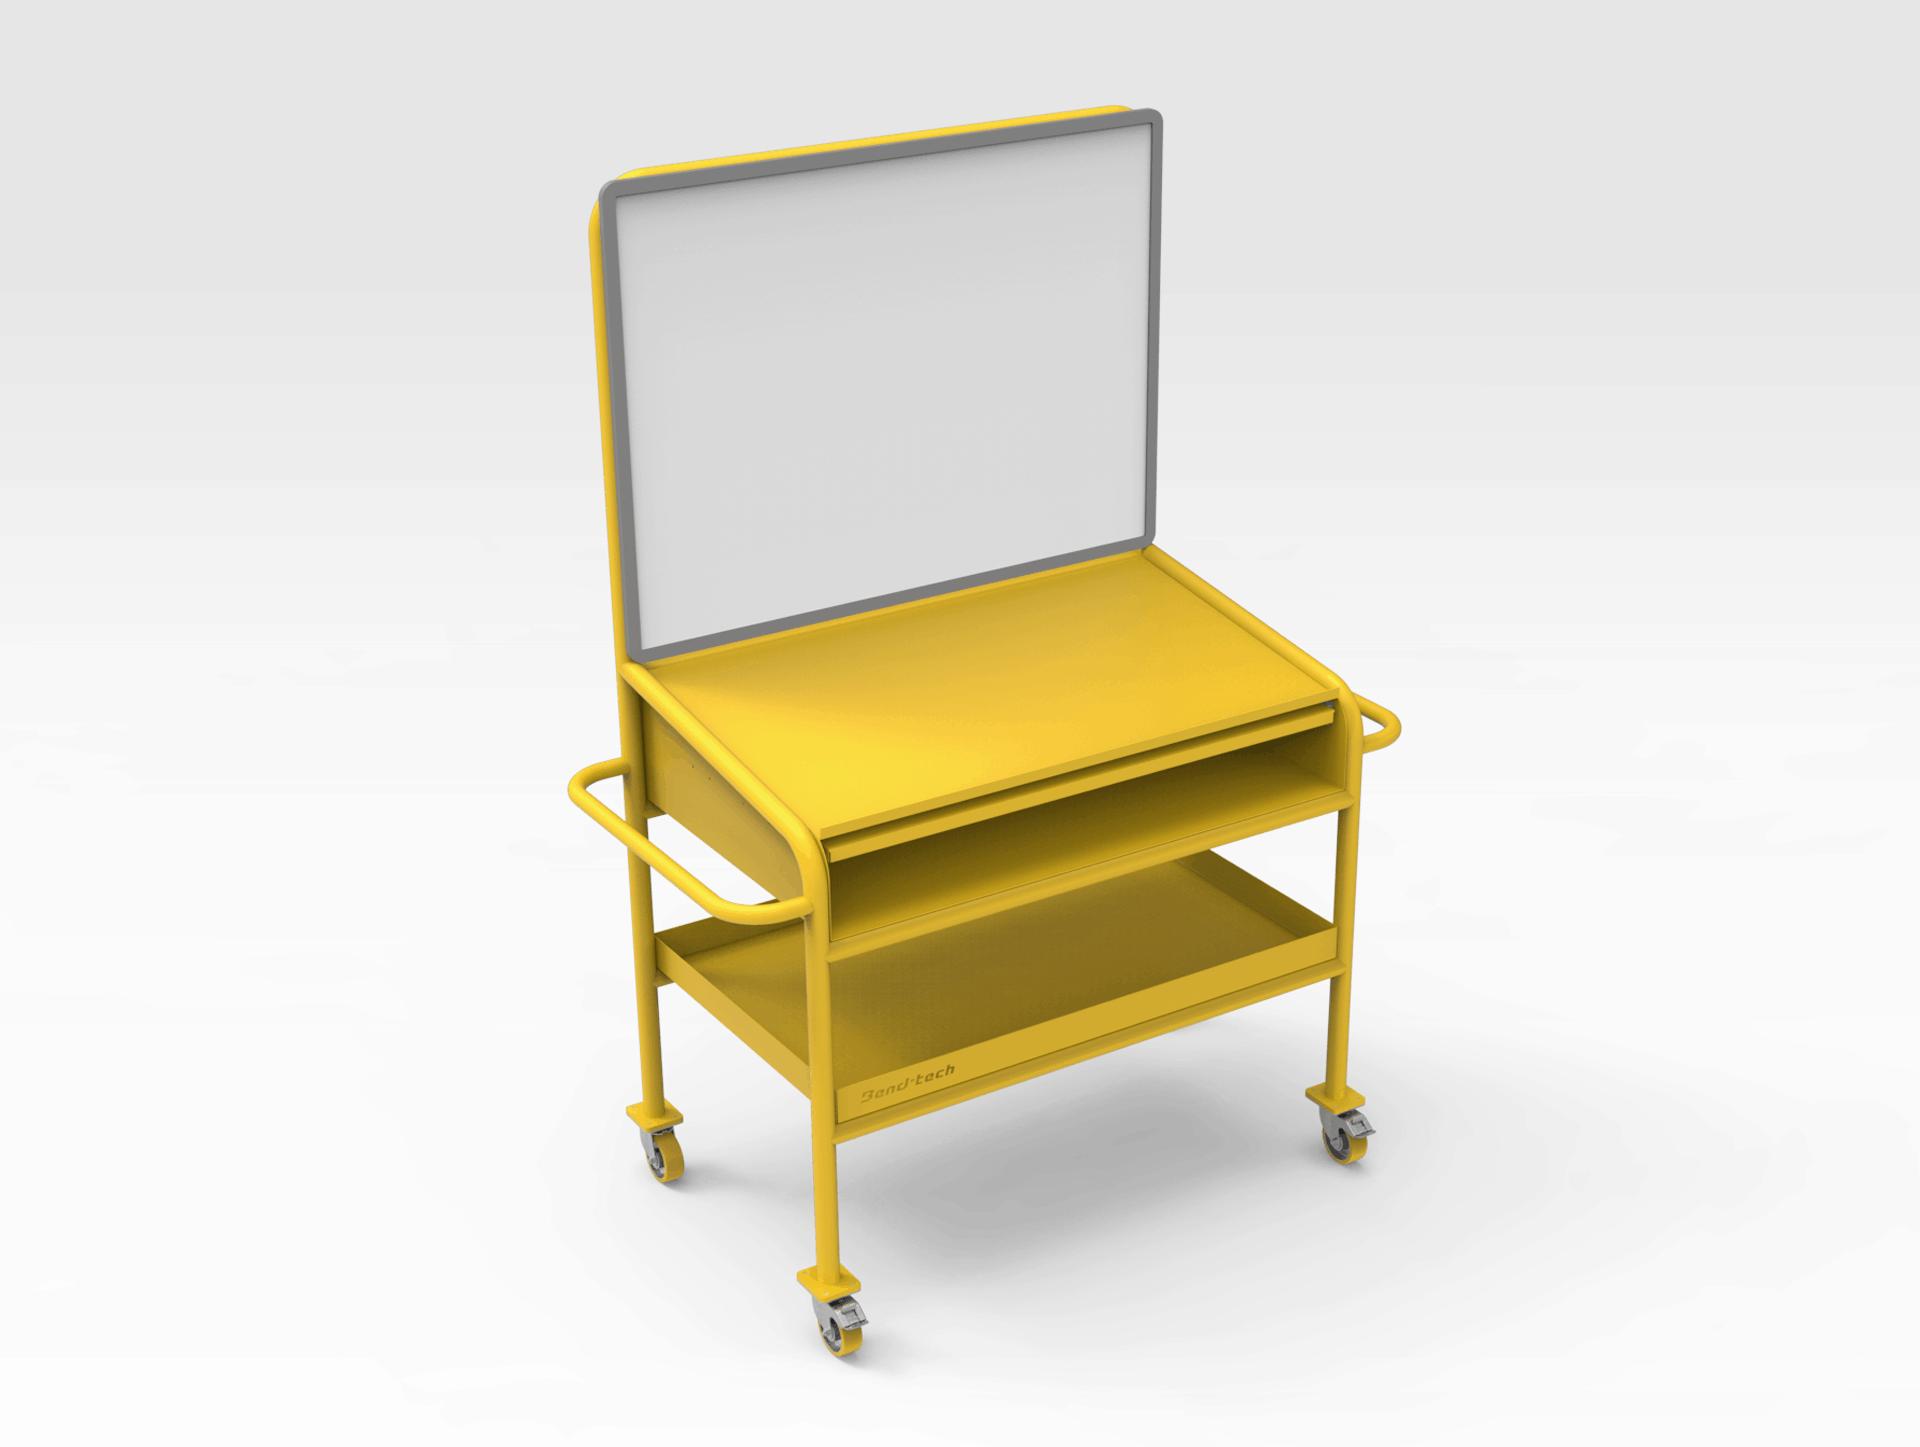 Whiteboard Bench